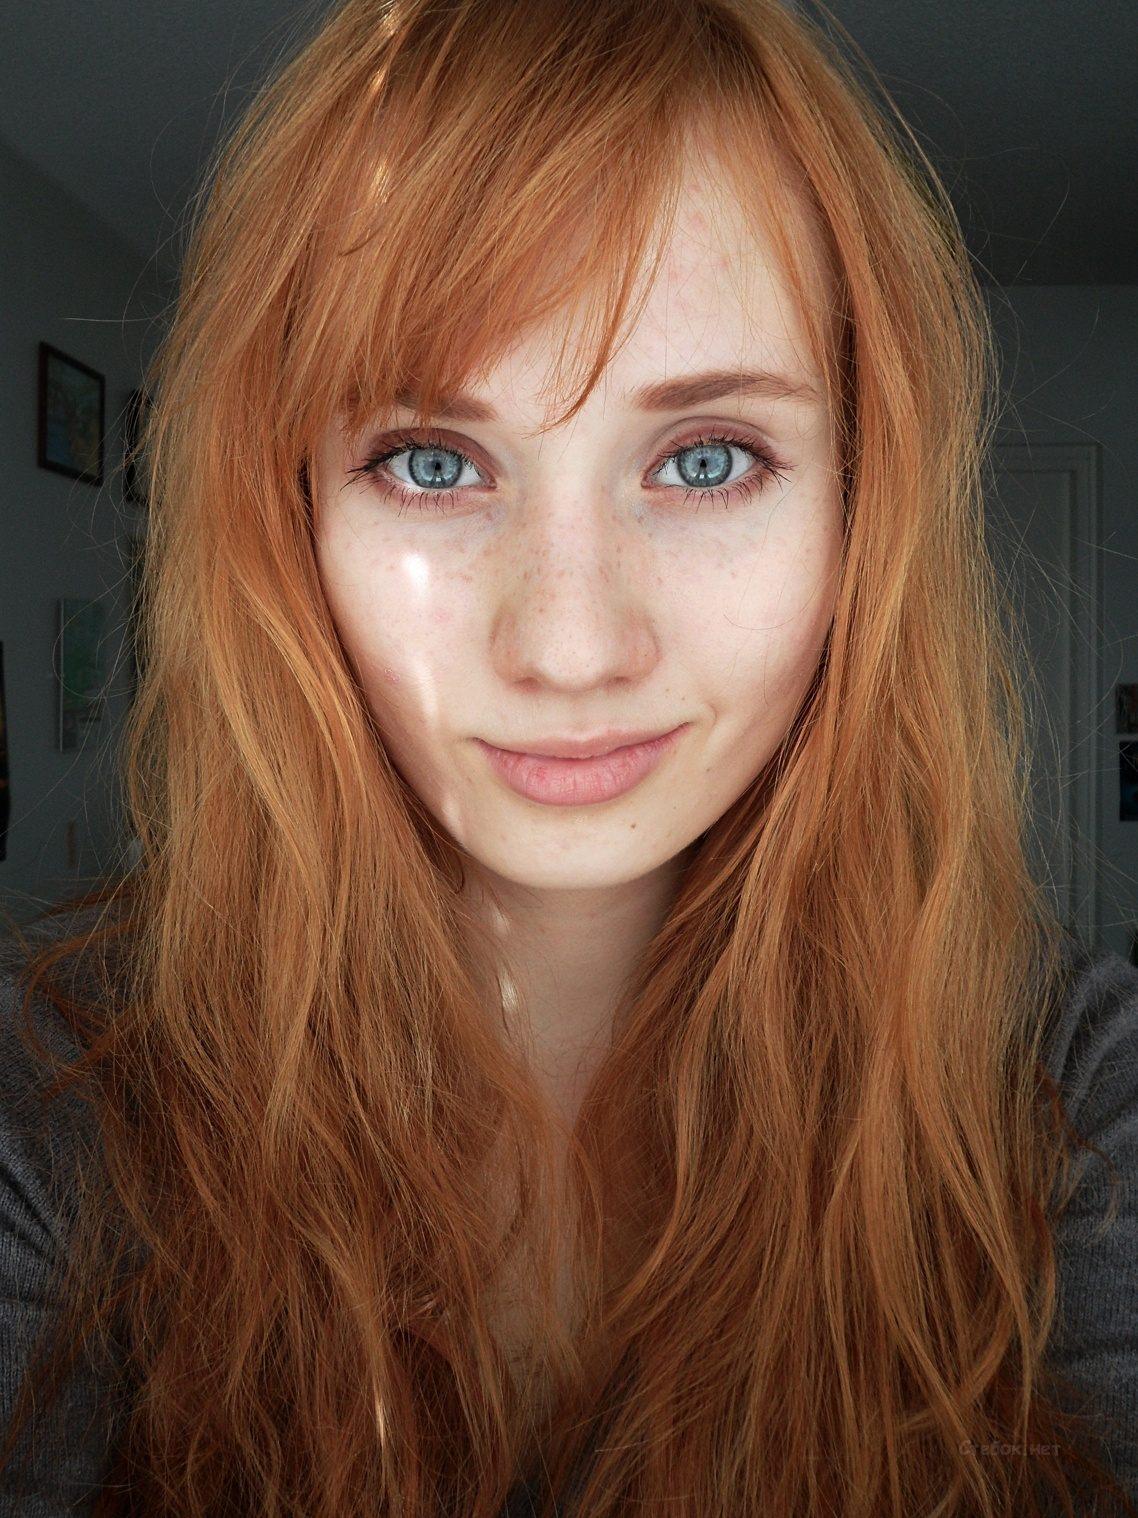 ����� ������� � ������ �������� (82 ����)